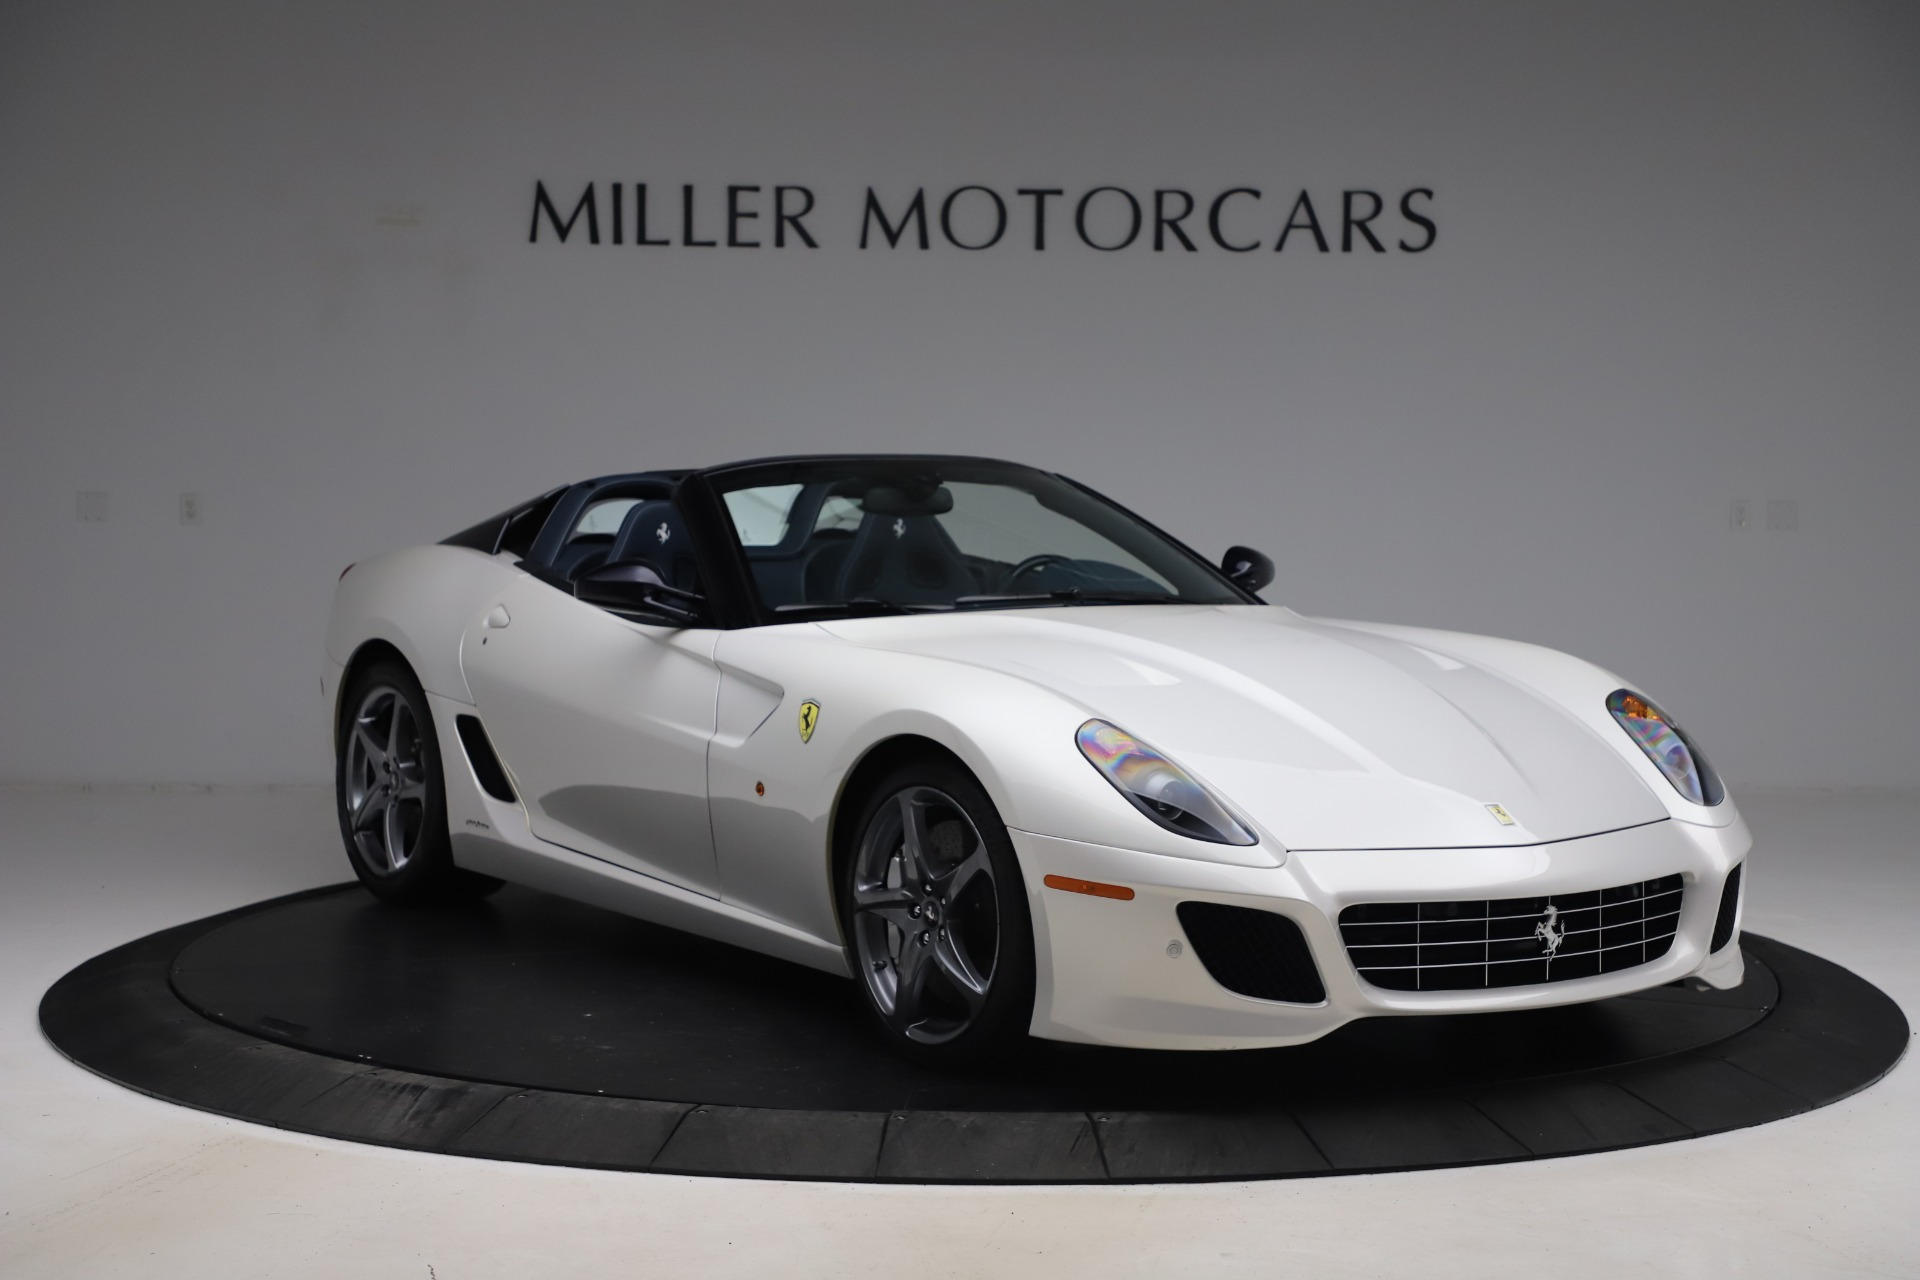 Pre Owned 2011 Ferrari 599 Sa Aperta For Sale 1 379 000 Miller Motorcars Stock 4995